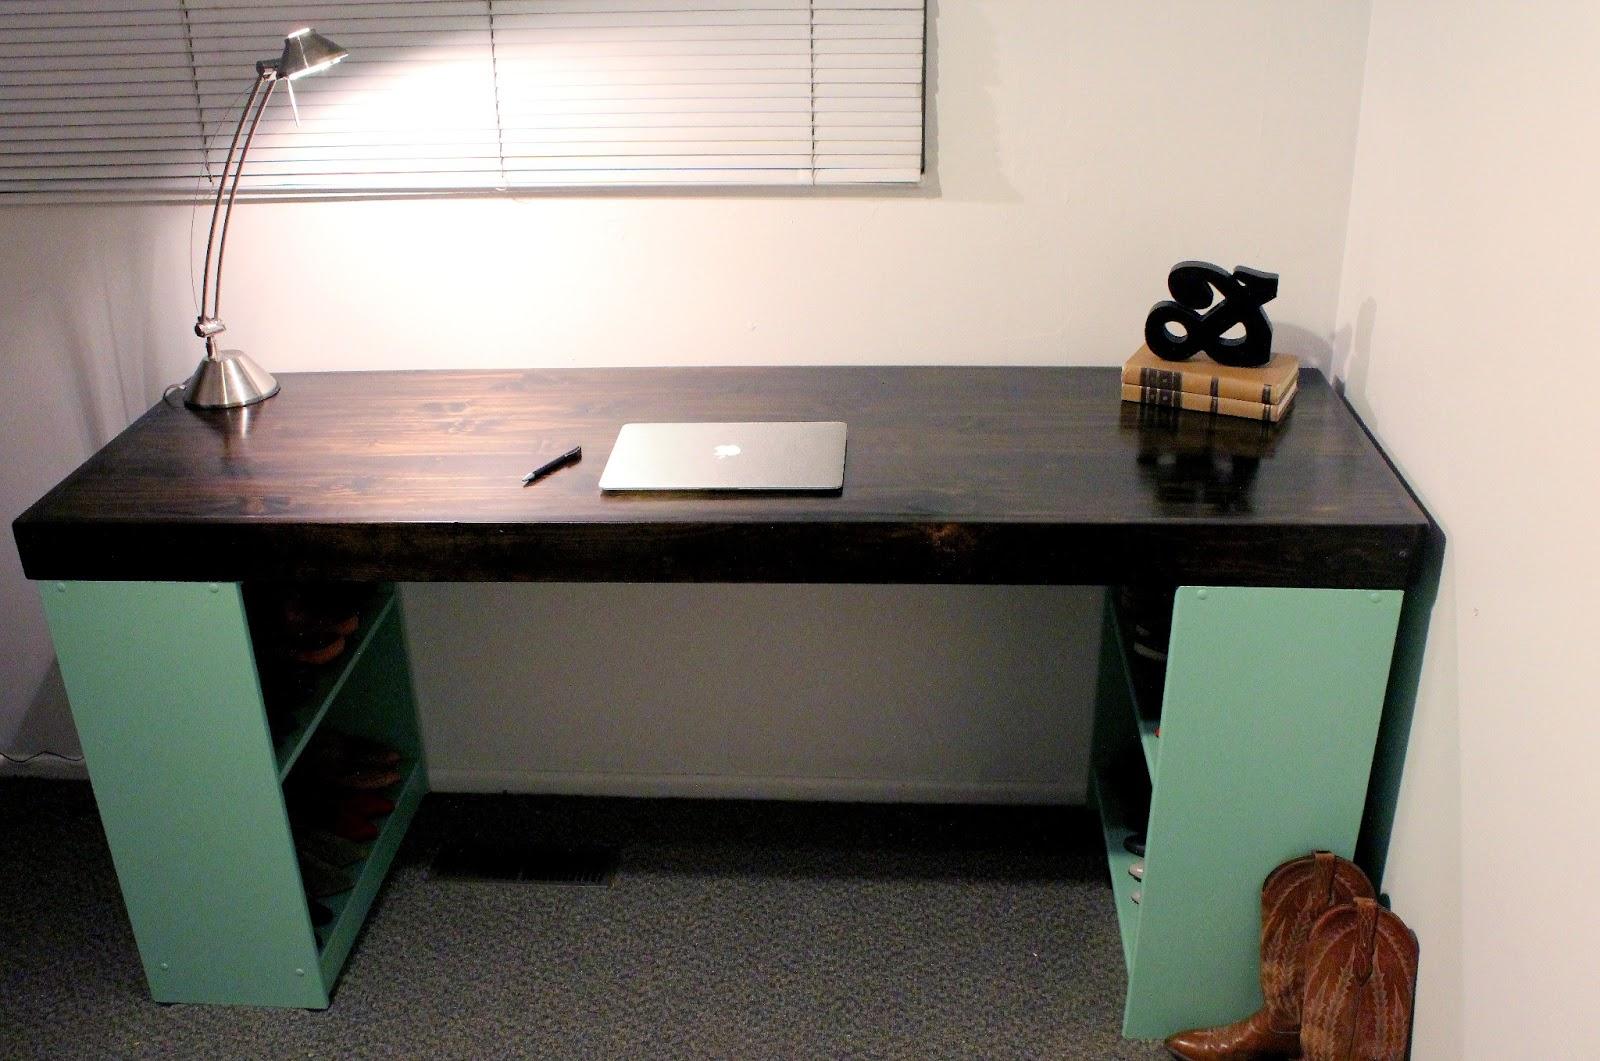 Office Desk Diy: DIY Mint Chocolate Chip Desk Tutorial